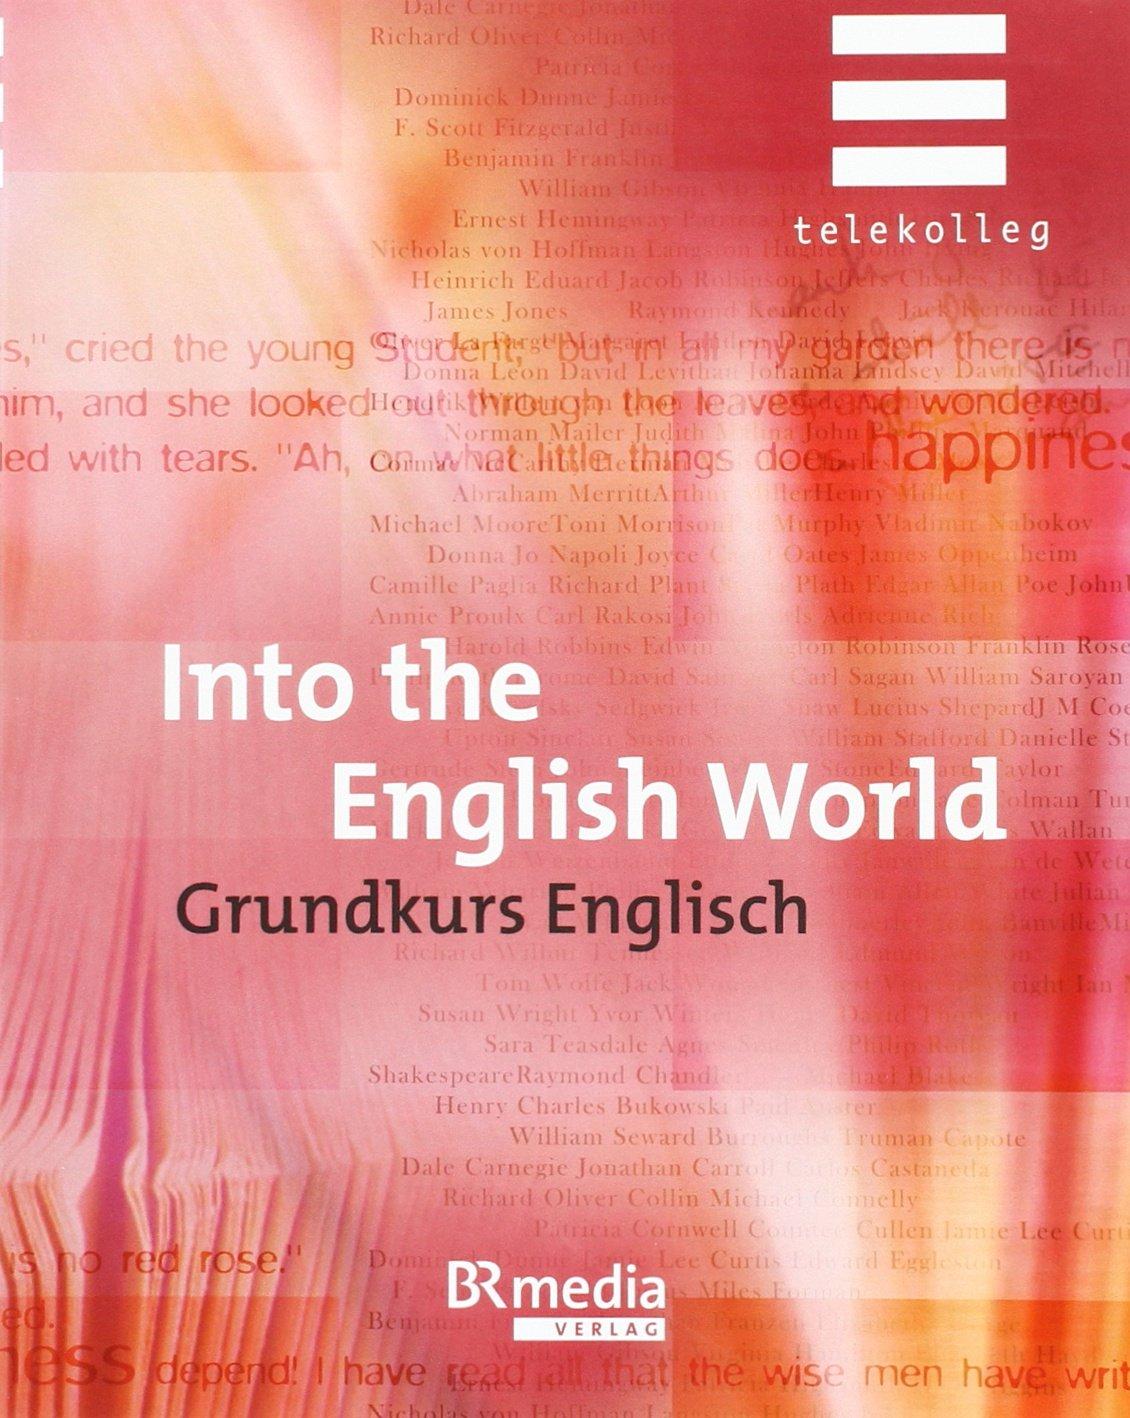 Into the English World - Grundkurs Englisch: Telekolleg